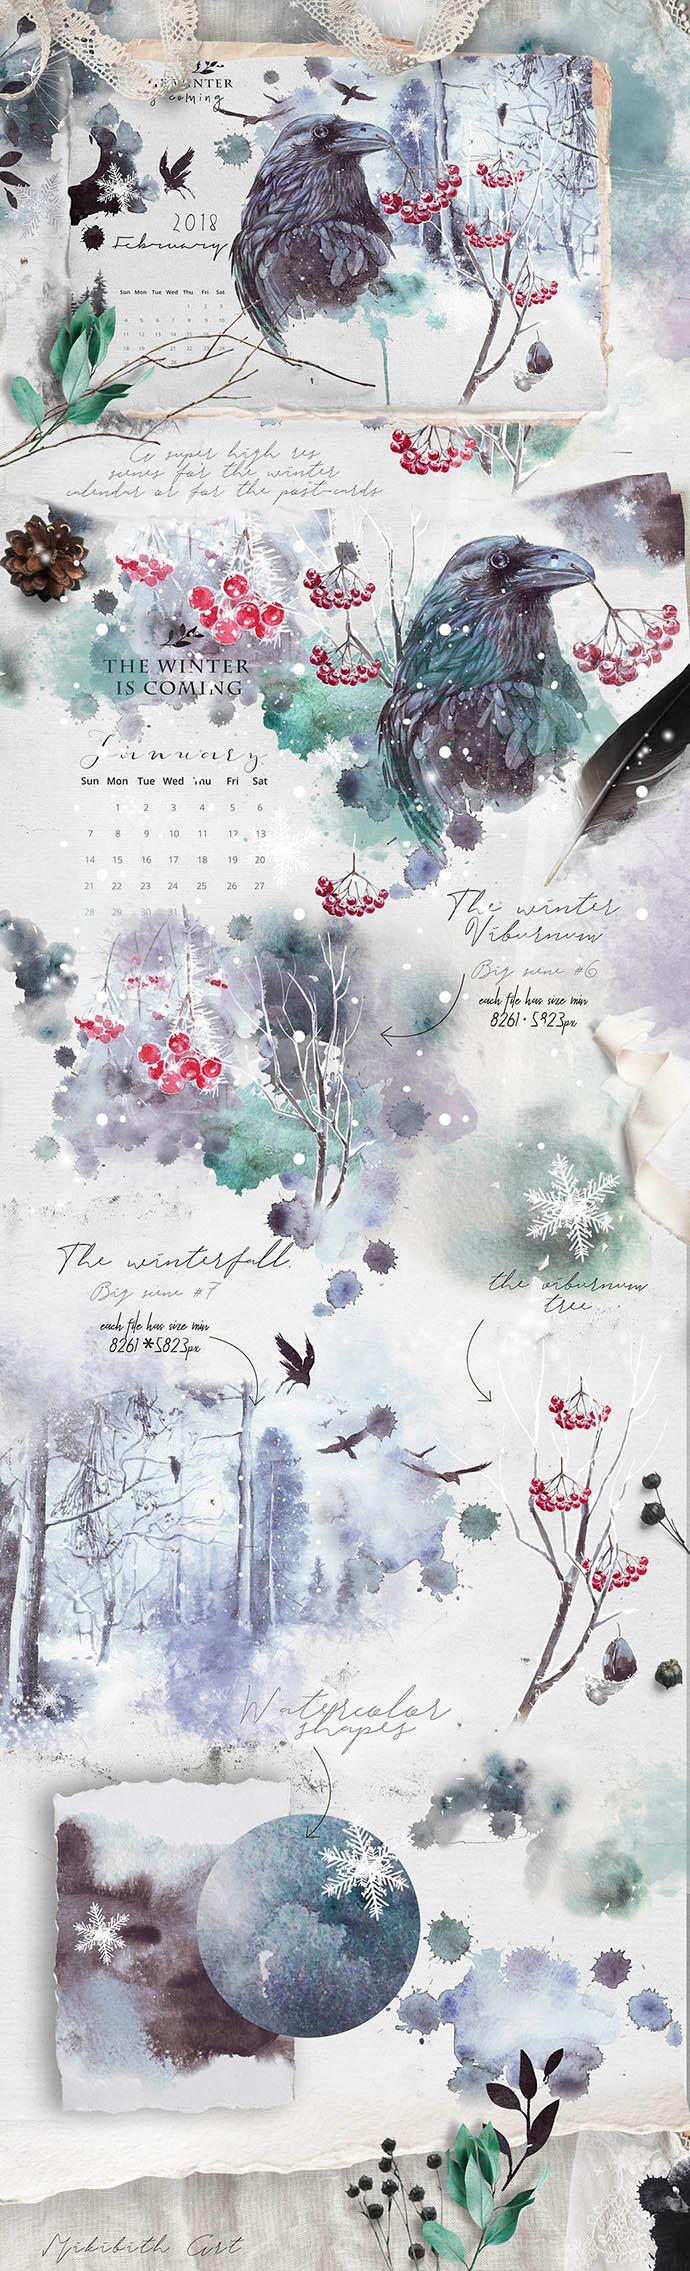 winter calendar 2018 Ravens